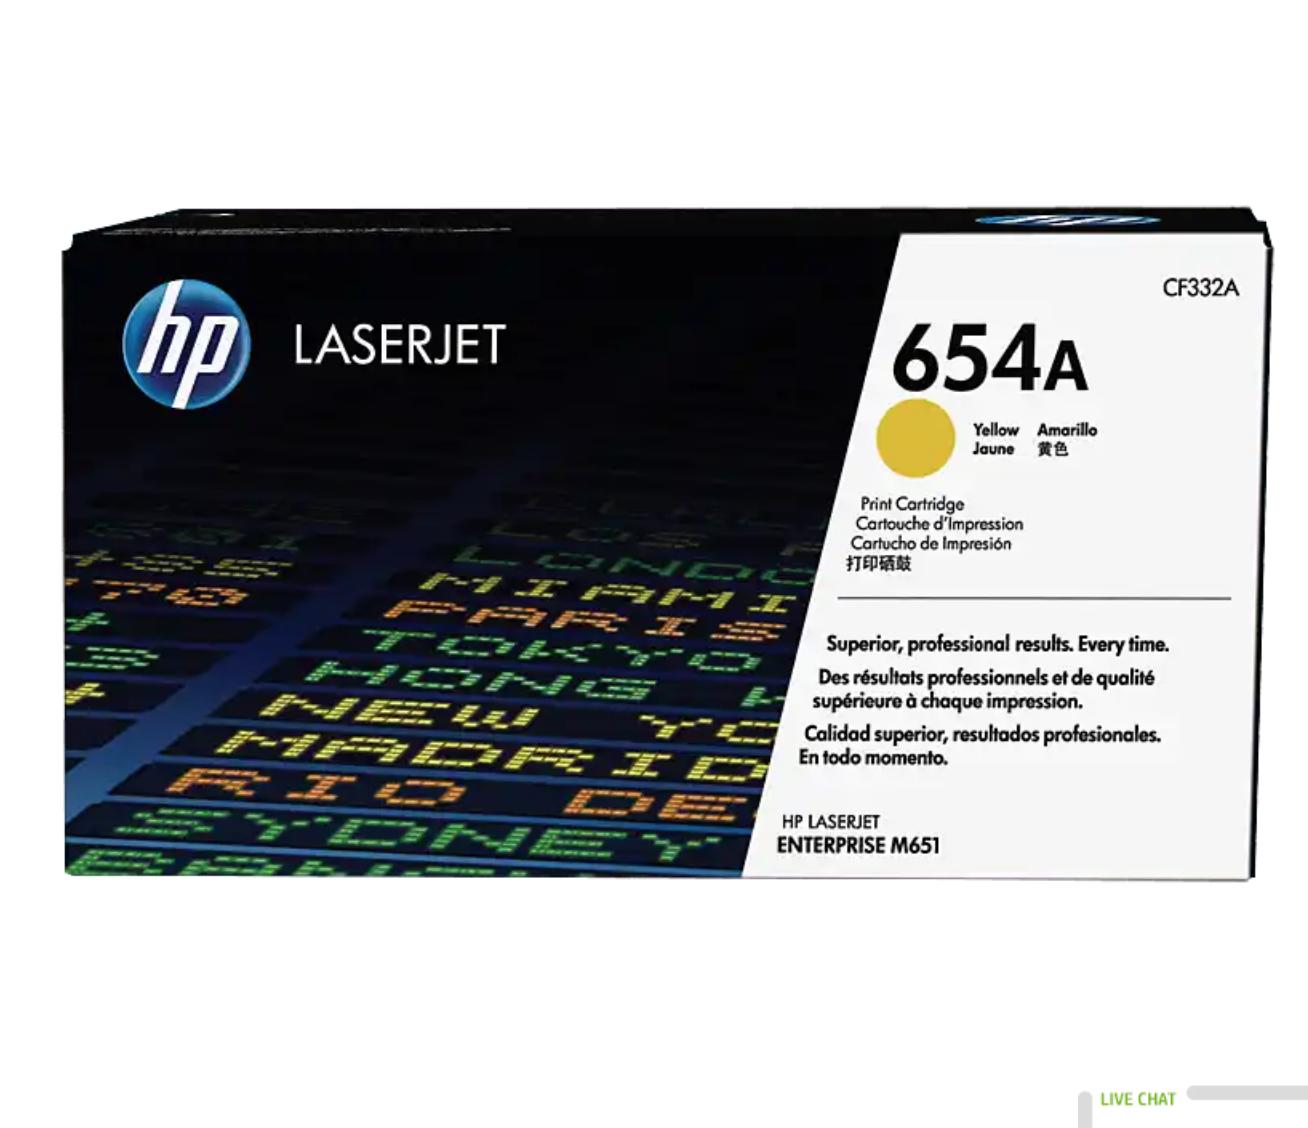 HP 654A 黃色原廠 LaserJet 碳粉 CF332A